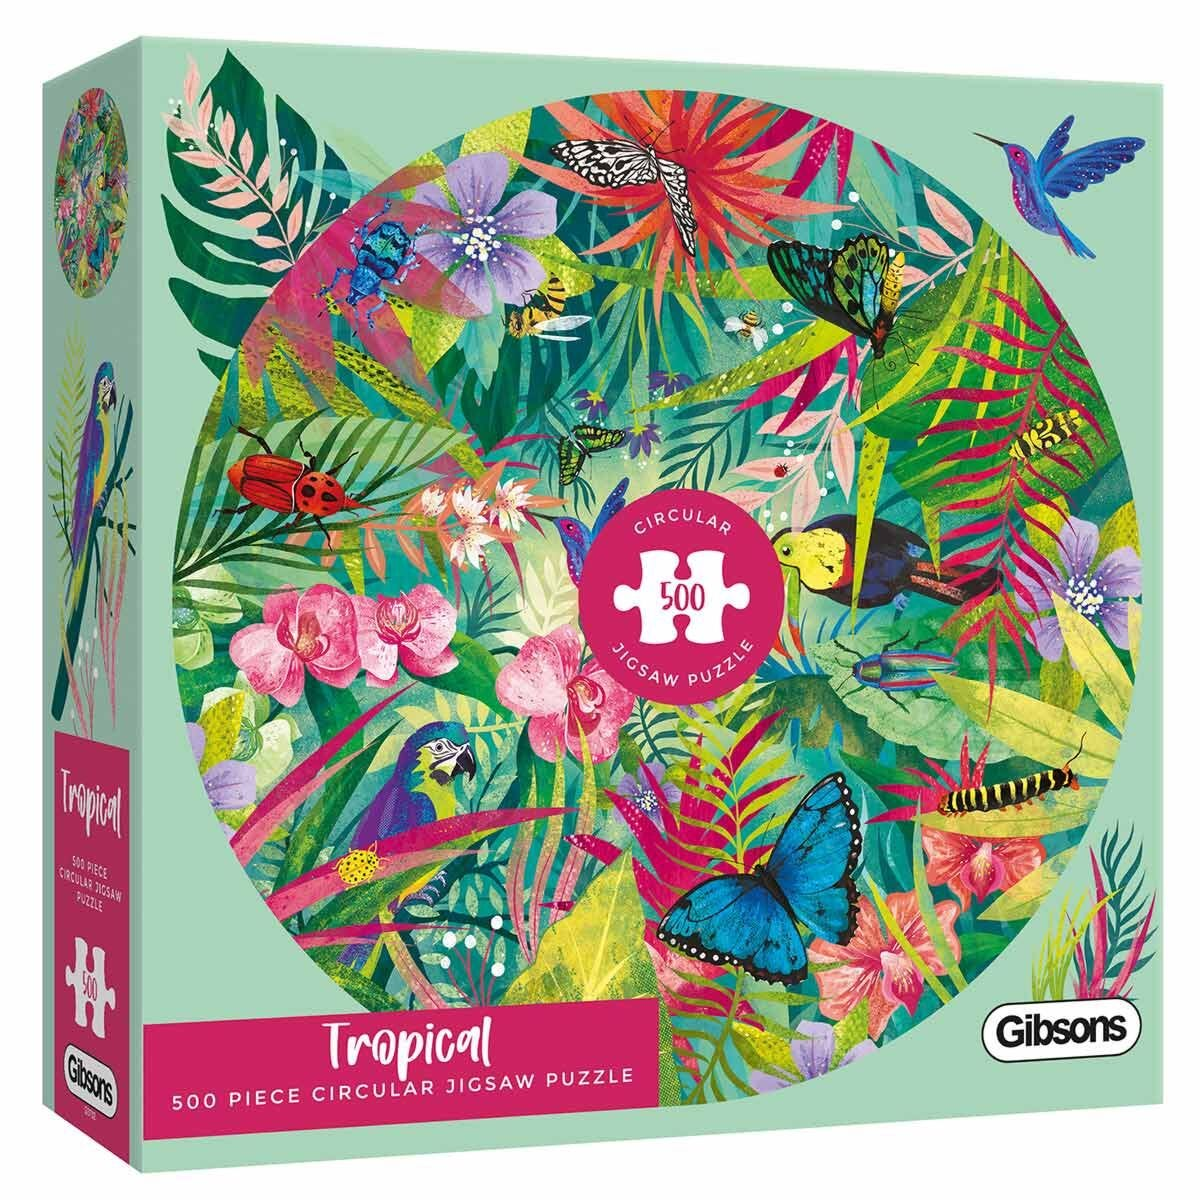 Gibsons Tropical Circular 500 Piece Jigsaw Puzzle